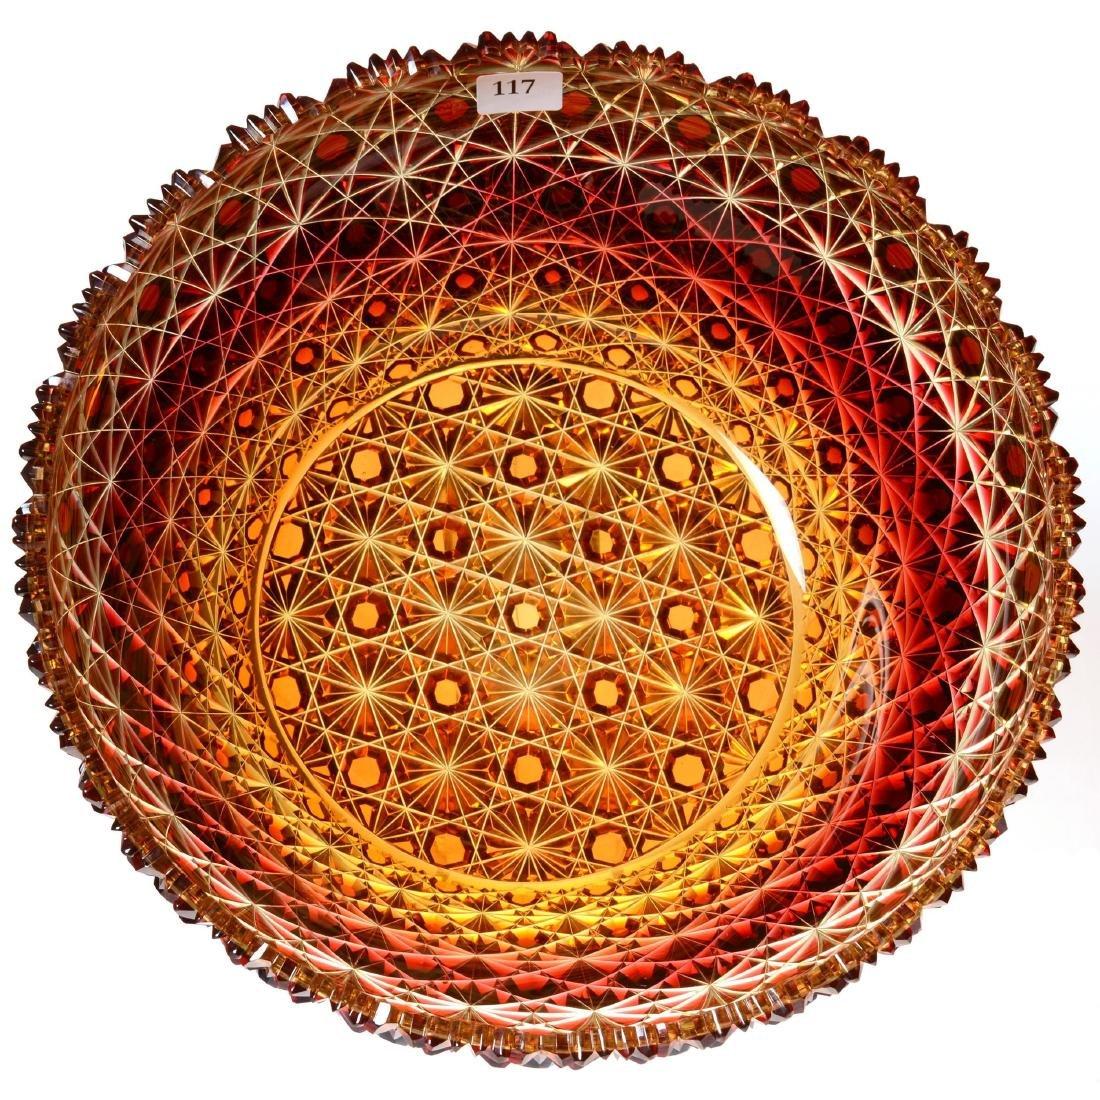 Extremely Rare Amberina Bowl - ABCG